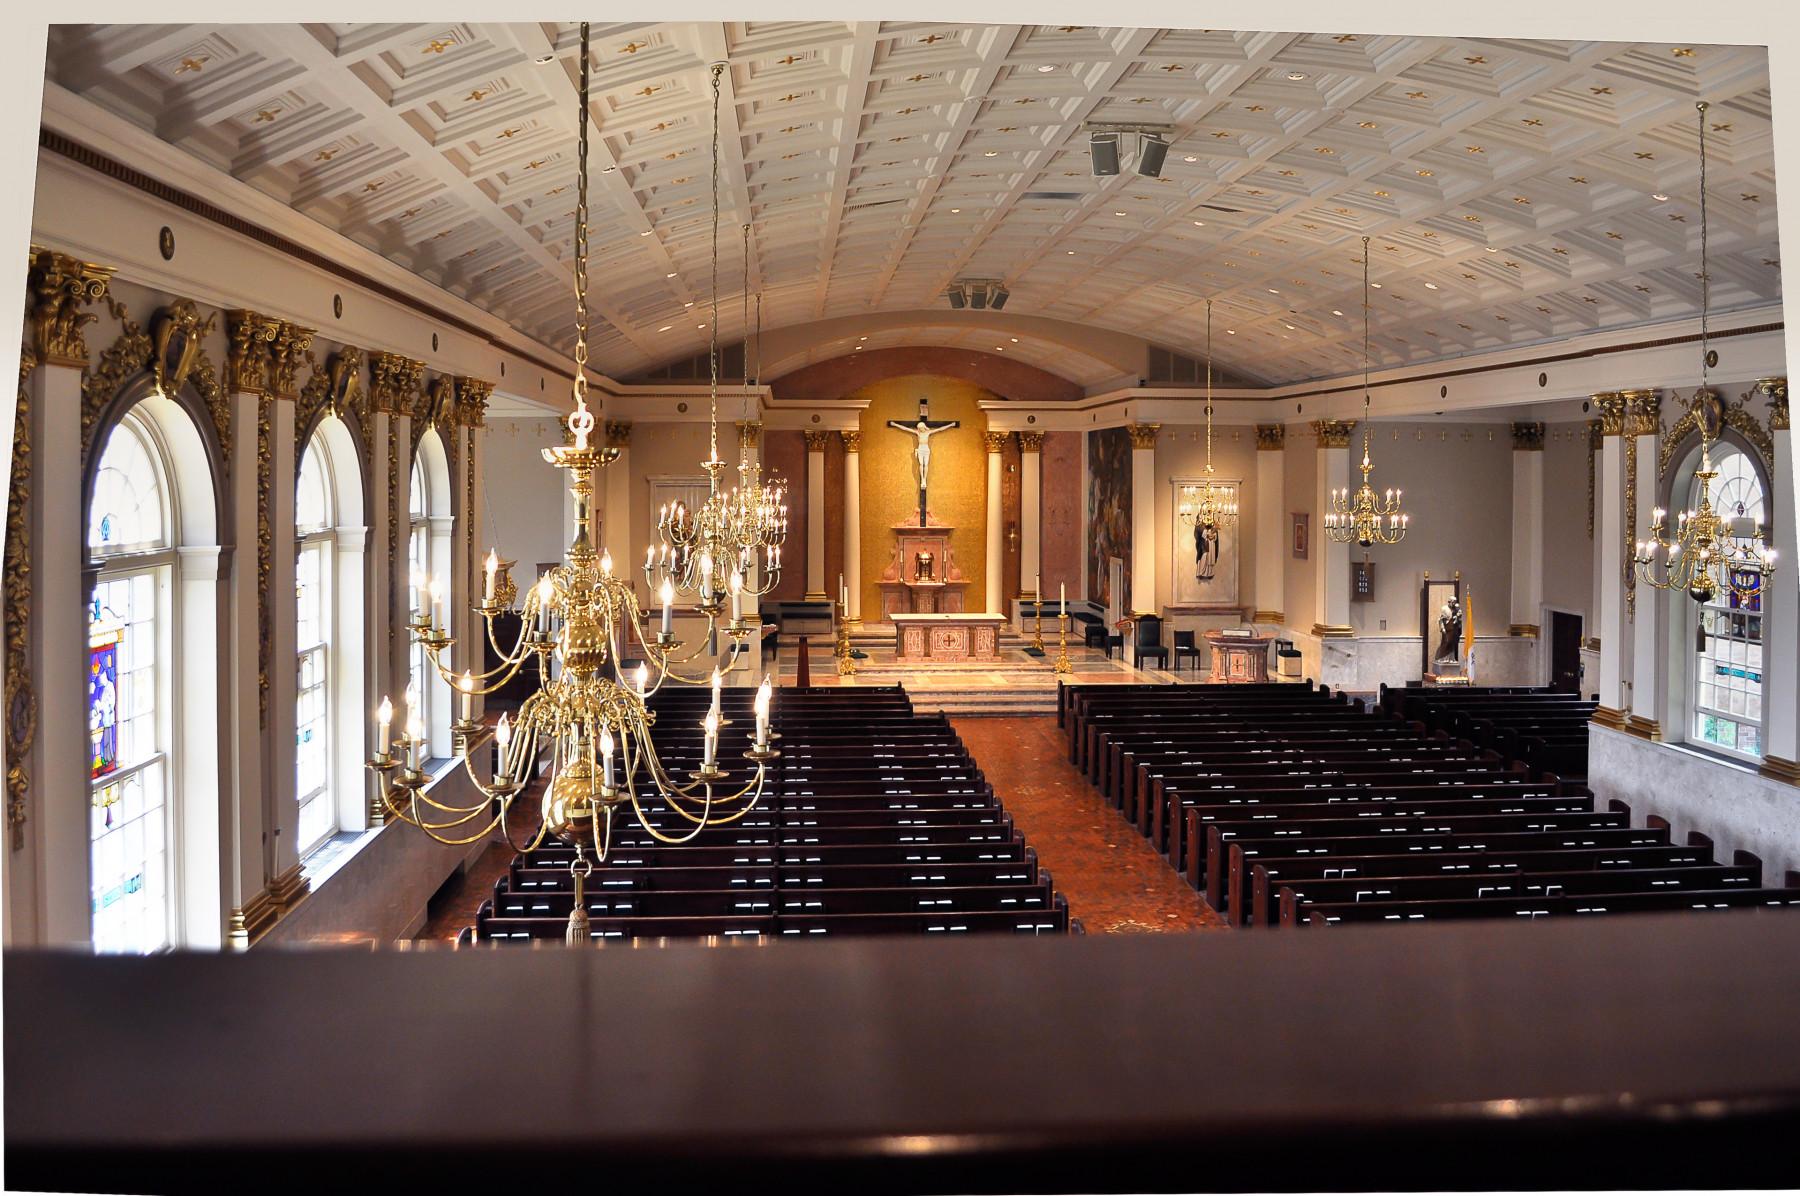 St. Catharine of Siena Allentown back